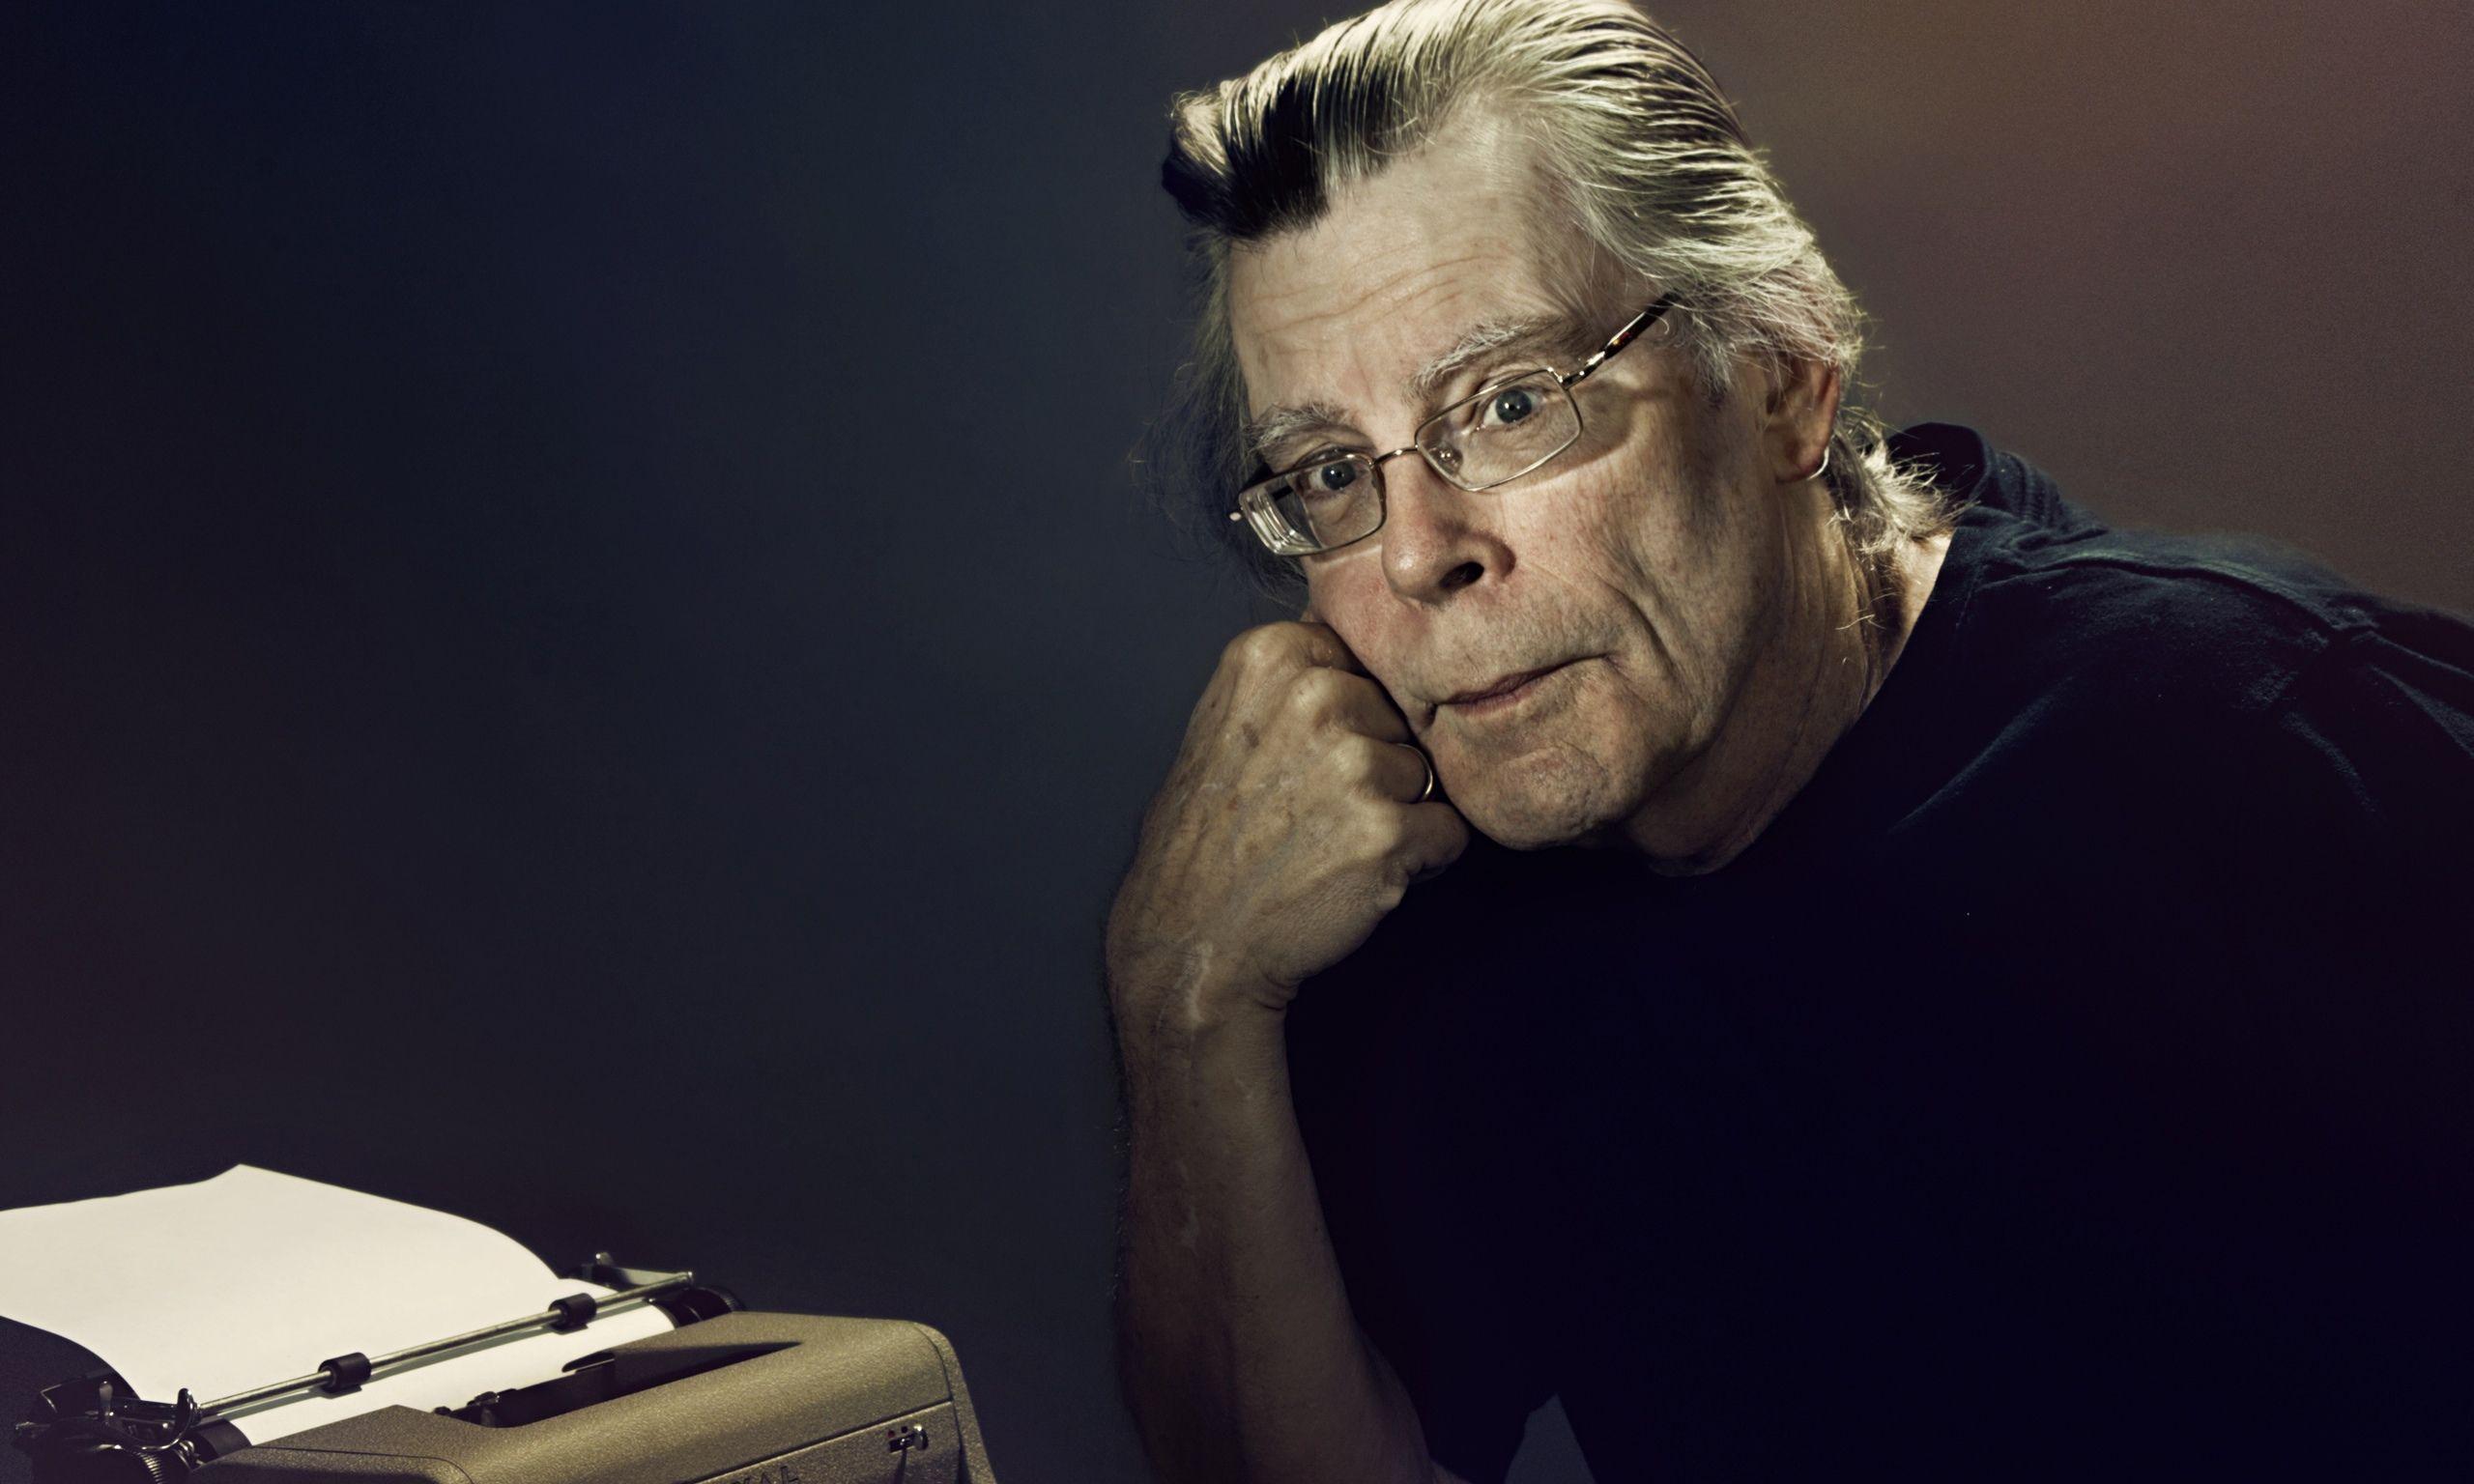 Stephen King: i dieci migliori libri horror consigliati